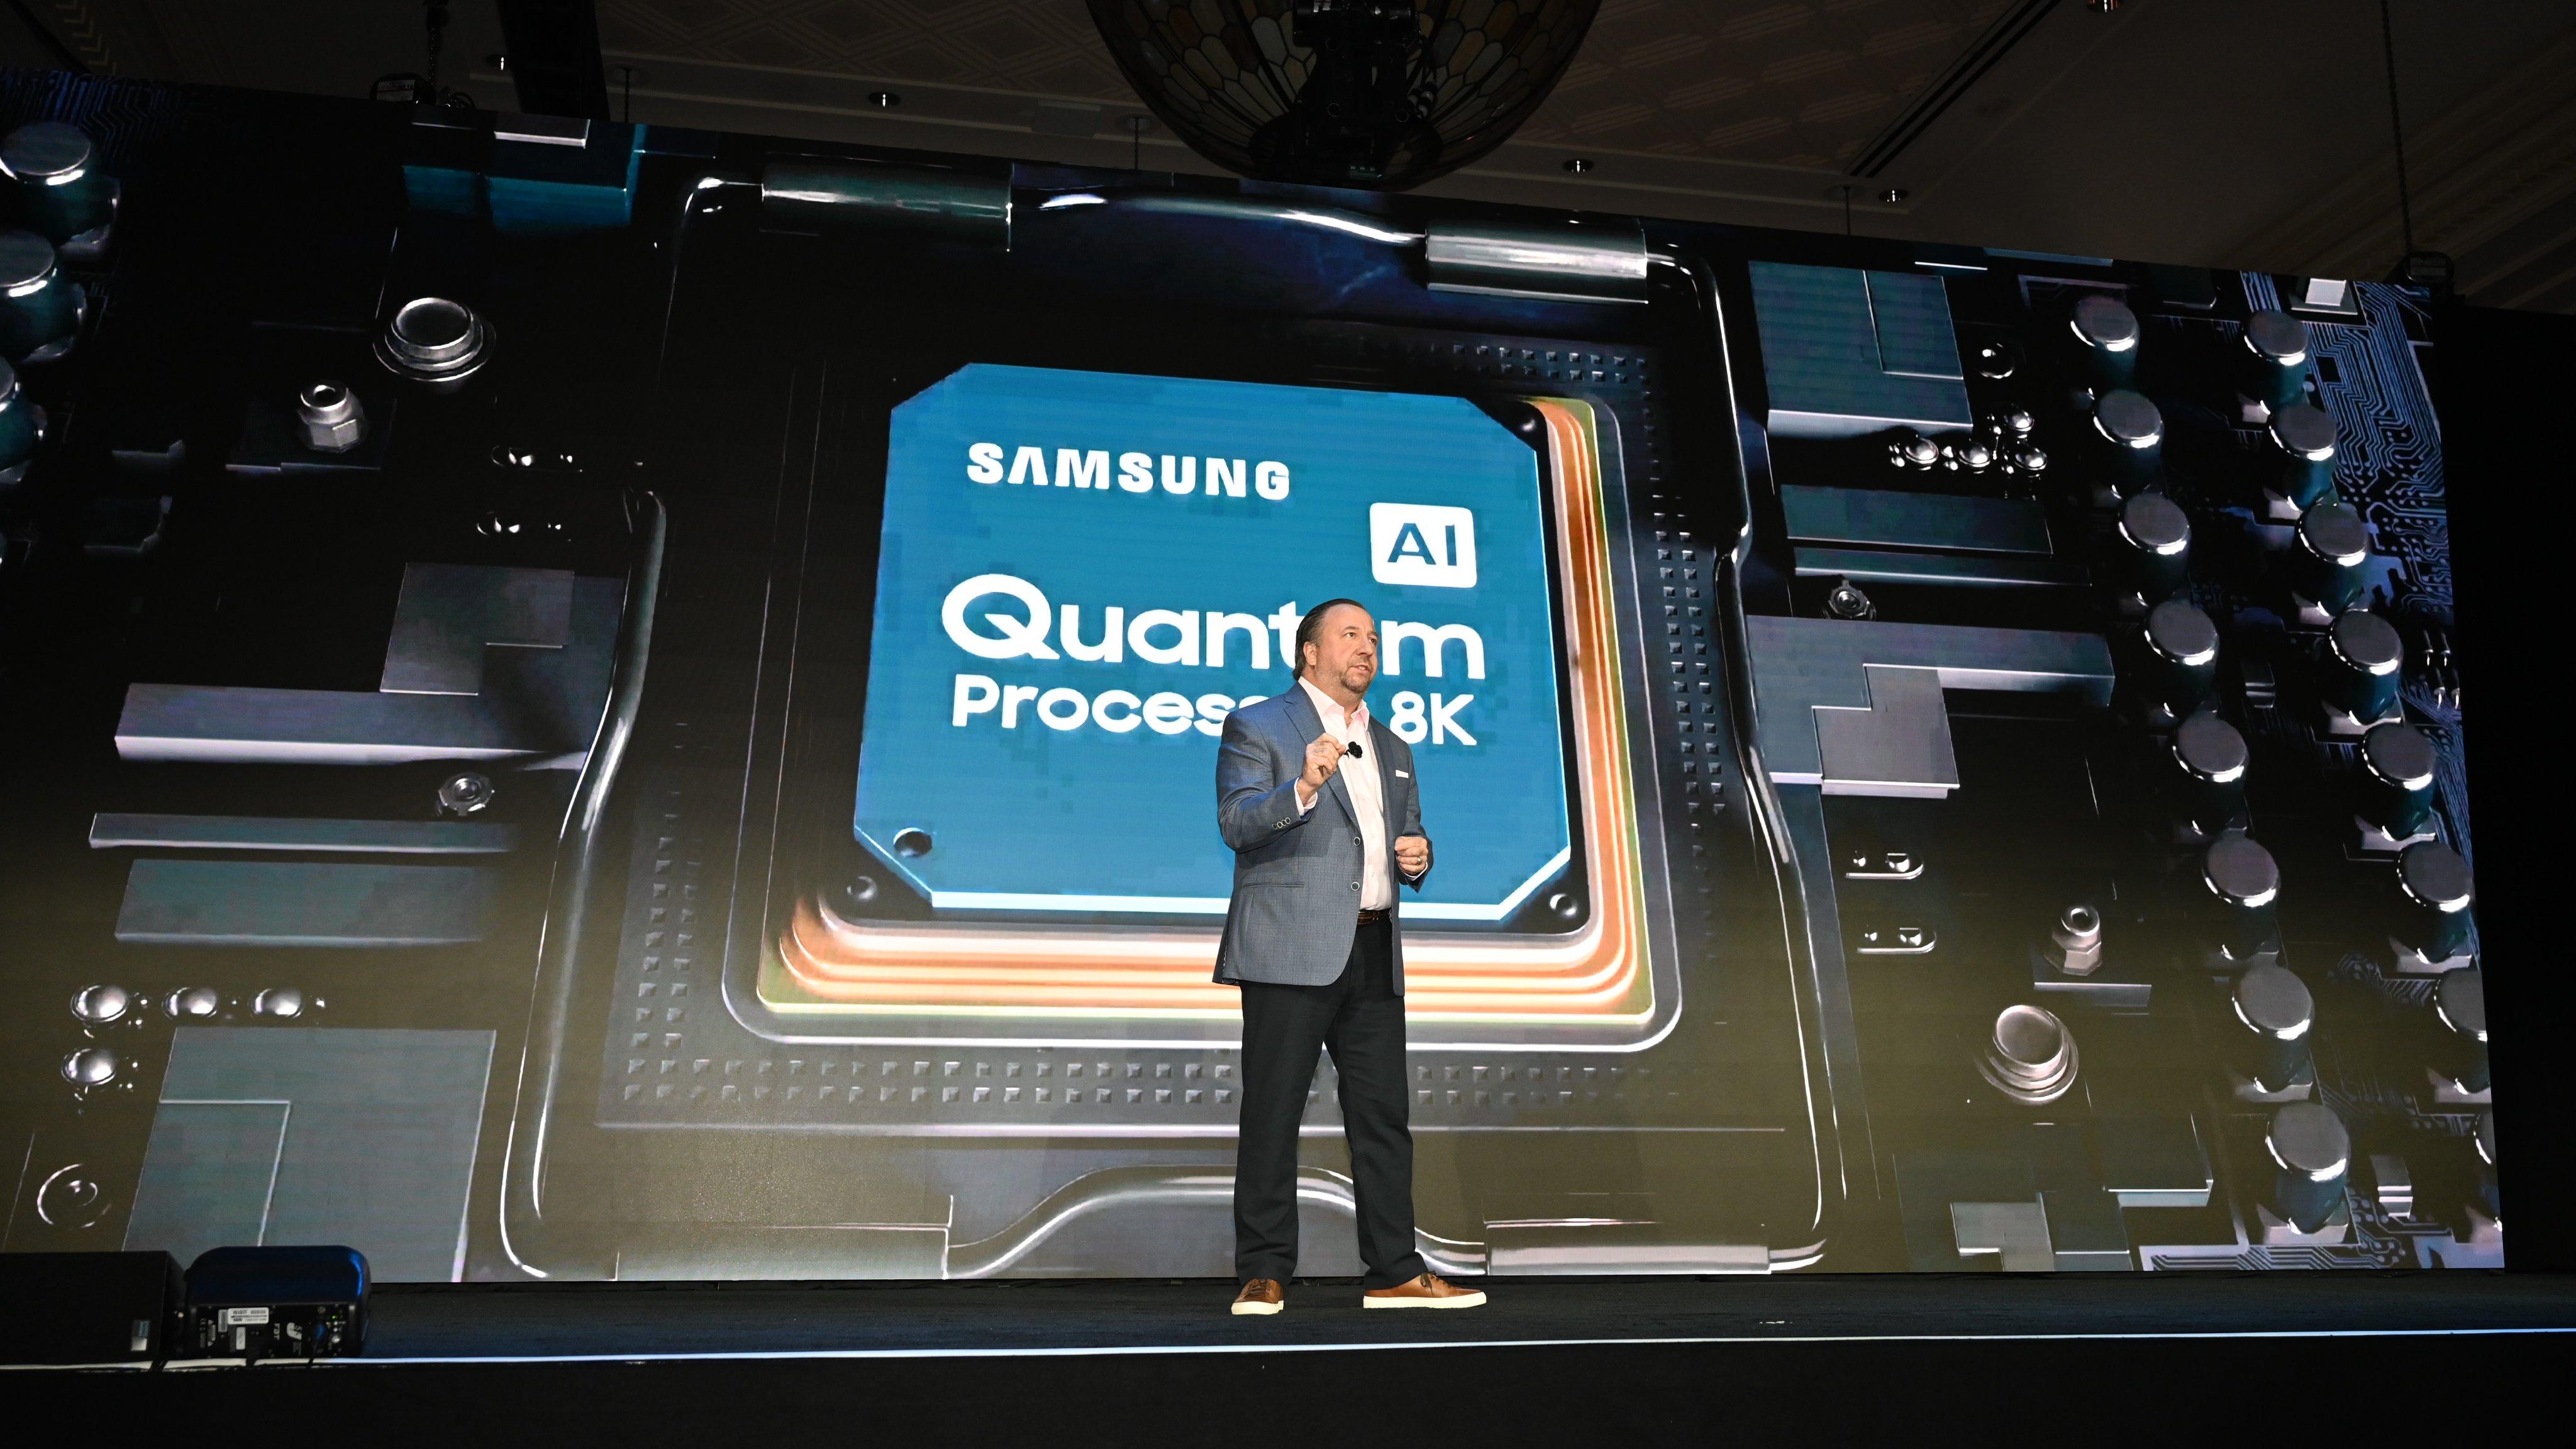 Samsung at CES 2020: Key takeaways